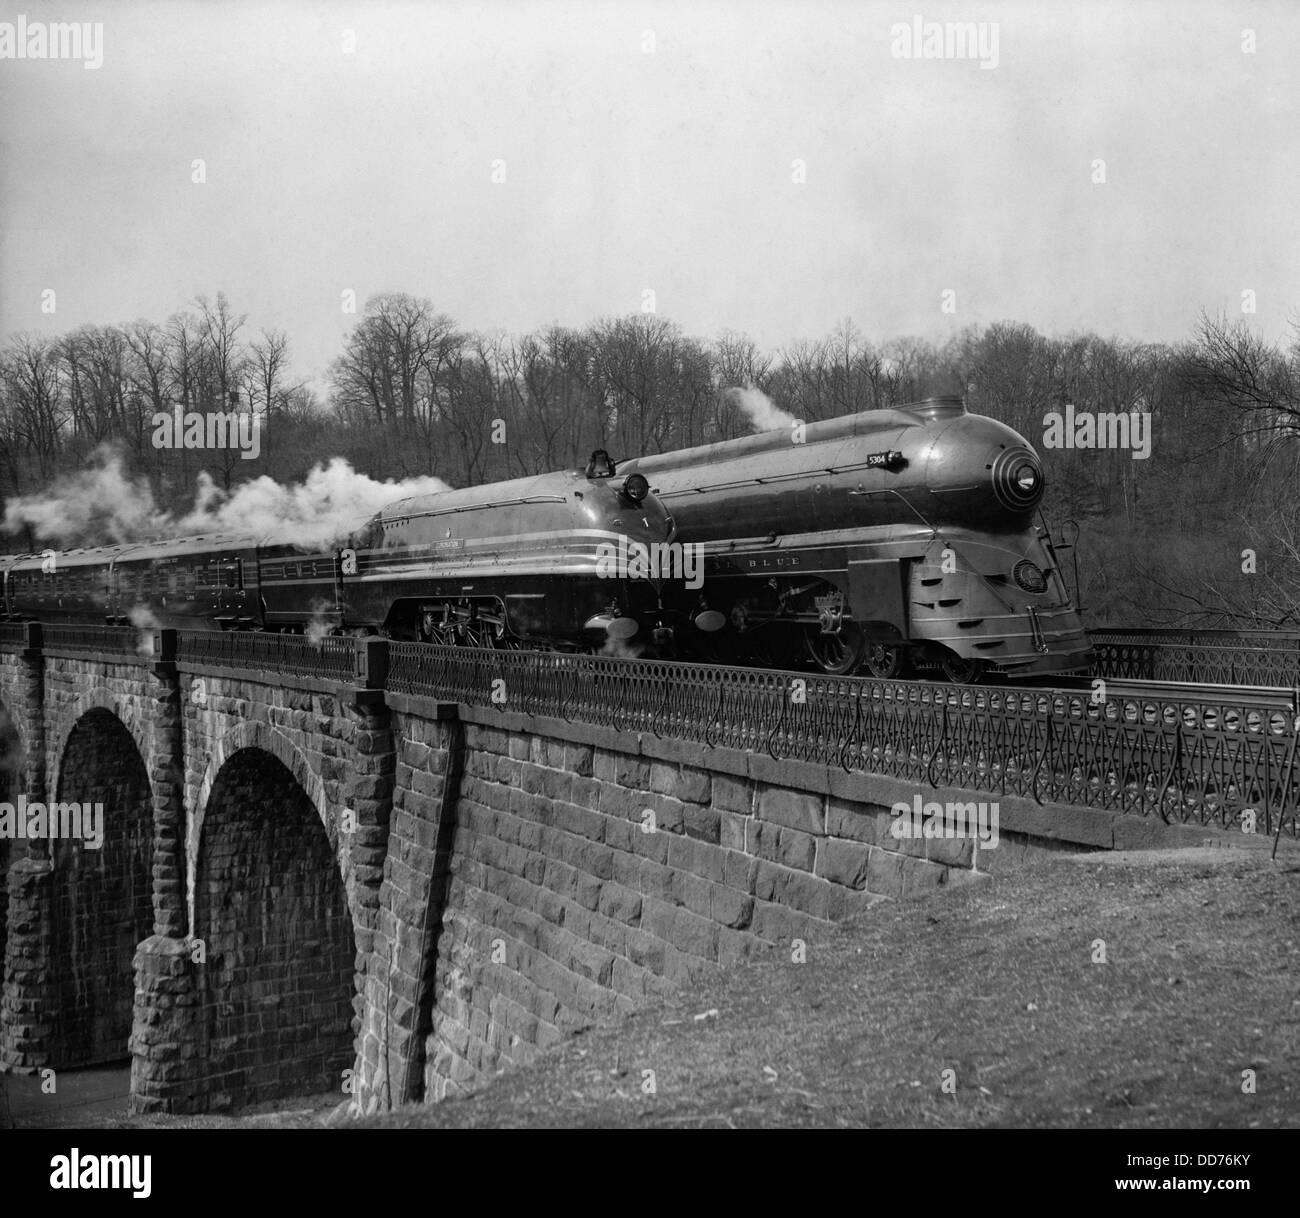 Two streamlined 1930s locomotives, near Washington, D.C. (BSLOC_2013_8_194) - Stock Image